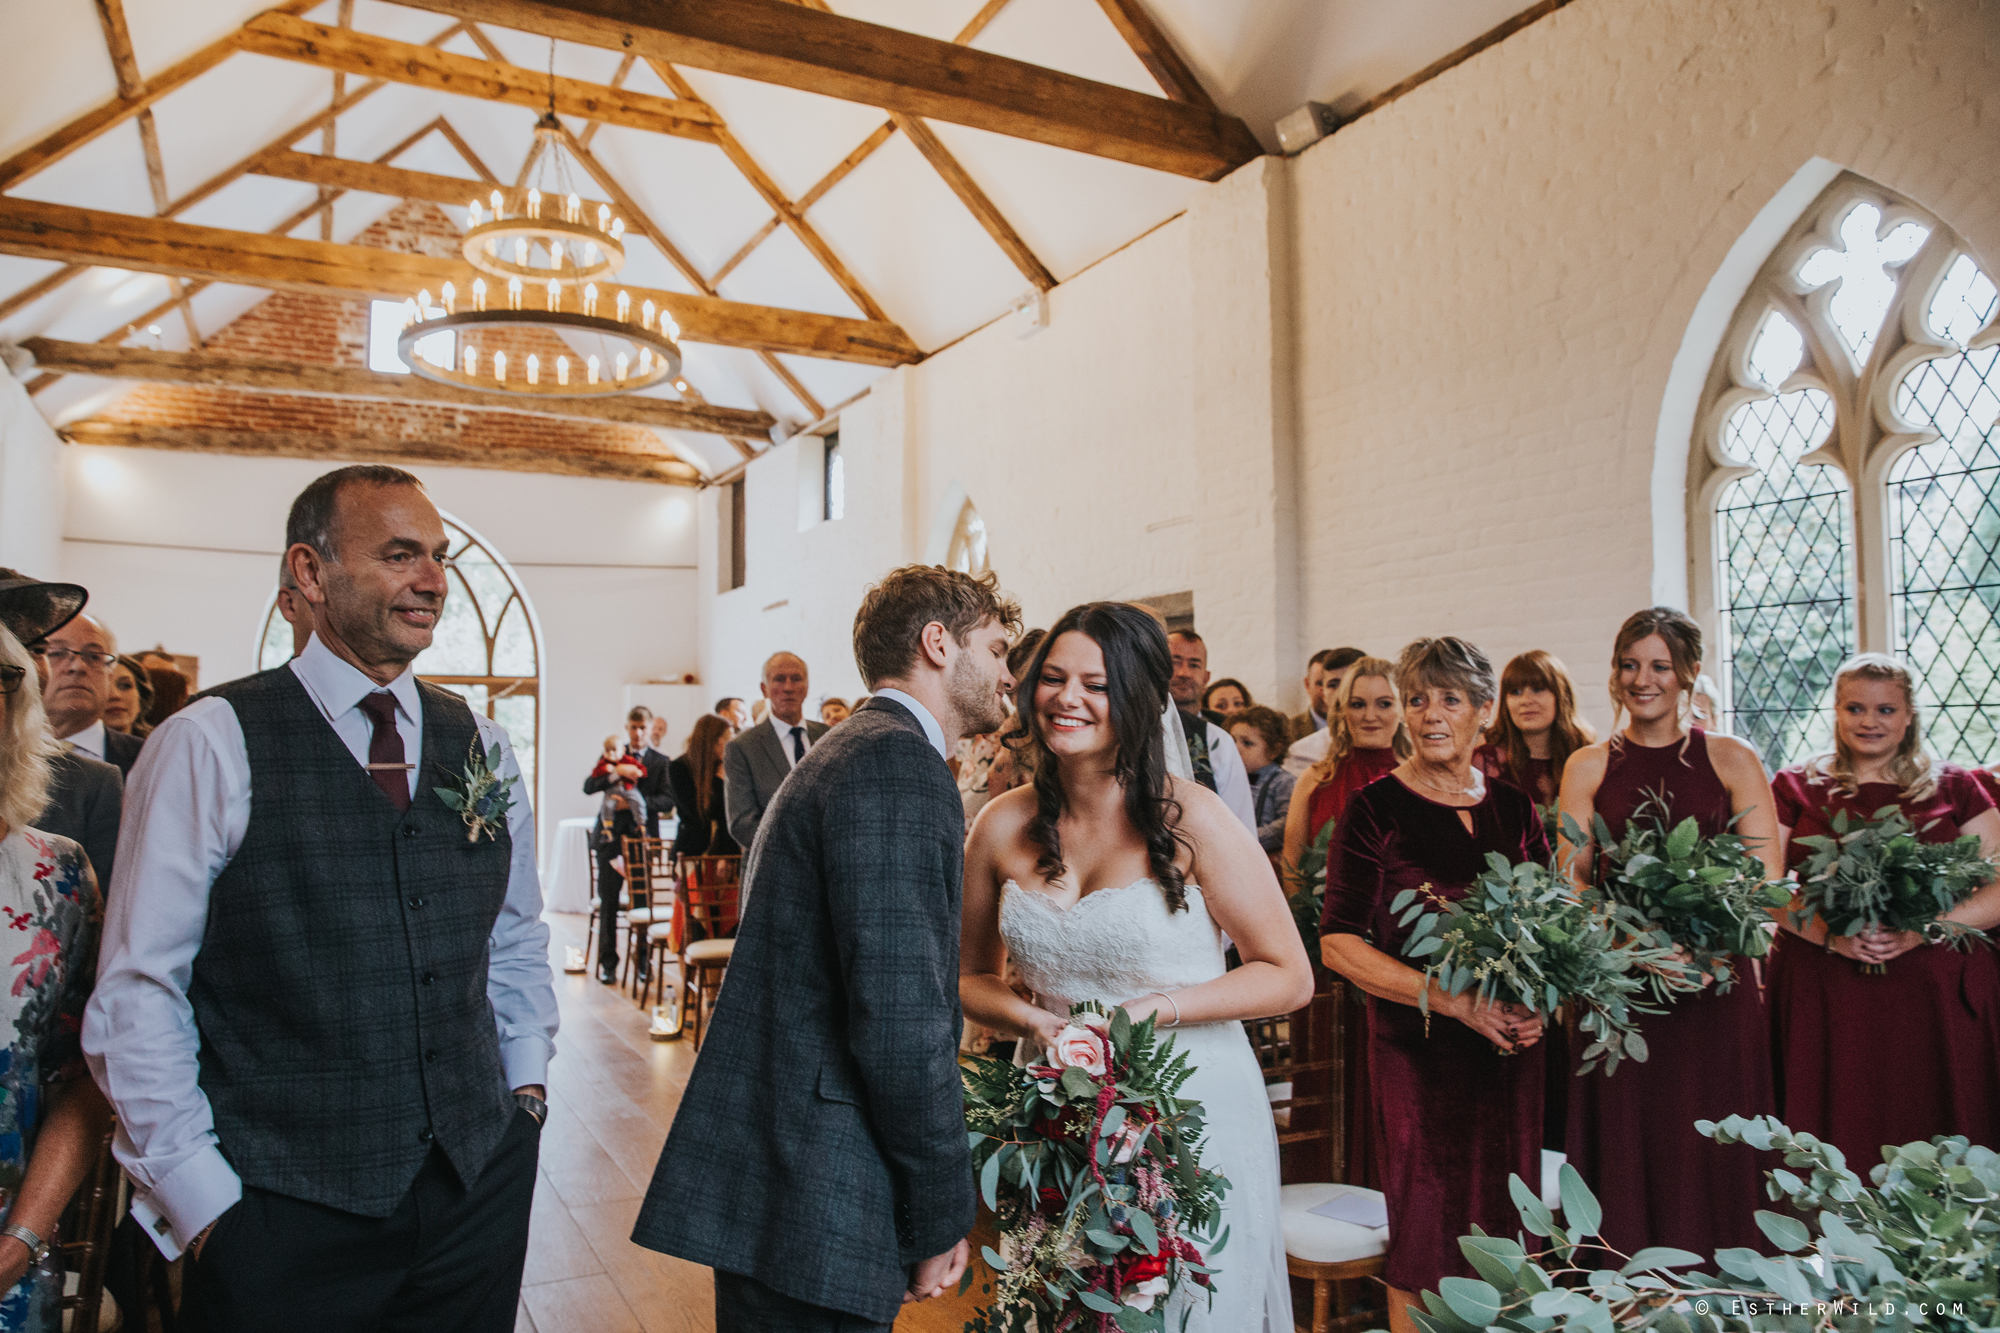 Reading_Room_Weddings_Alby_Norwich_Photographer_Esther_Wild_IMG_0859.jpg